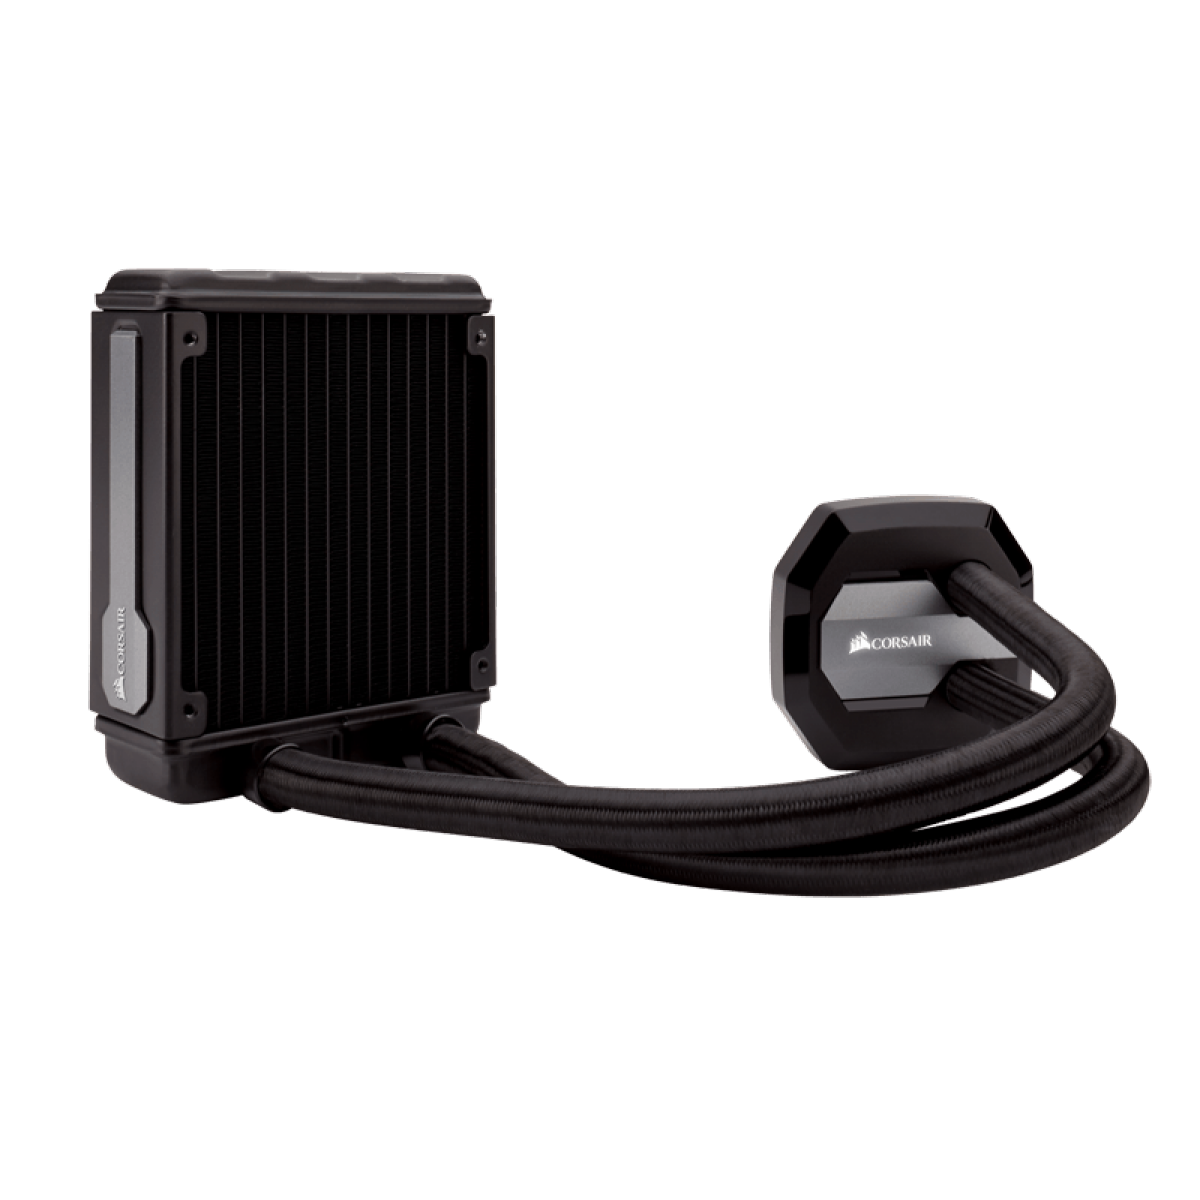 Watercooler - Corsair Hydro Series H80i V2 AMD - CW-9060024-WW - OPEN BOX